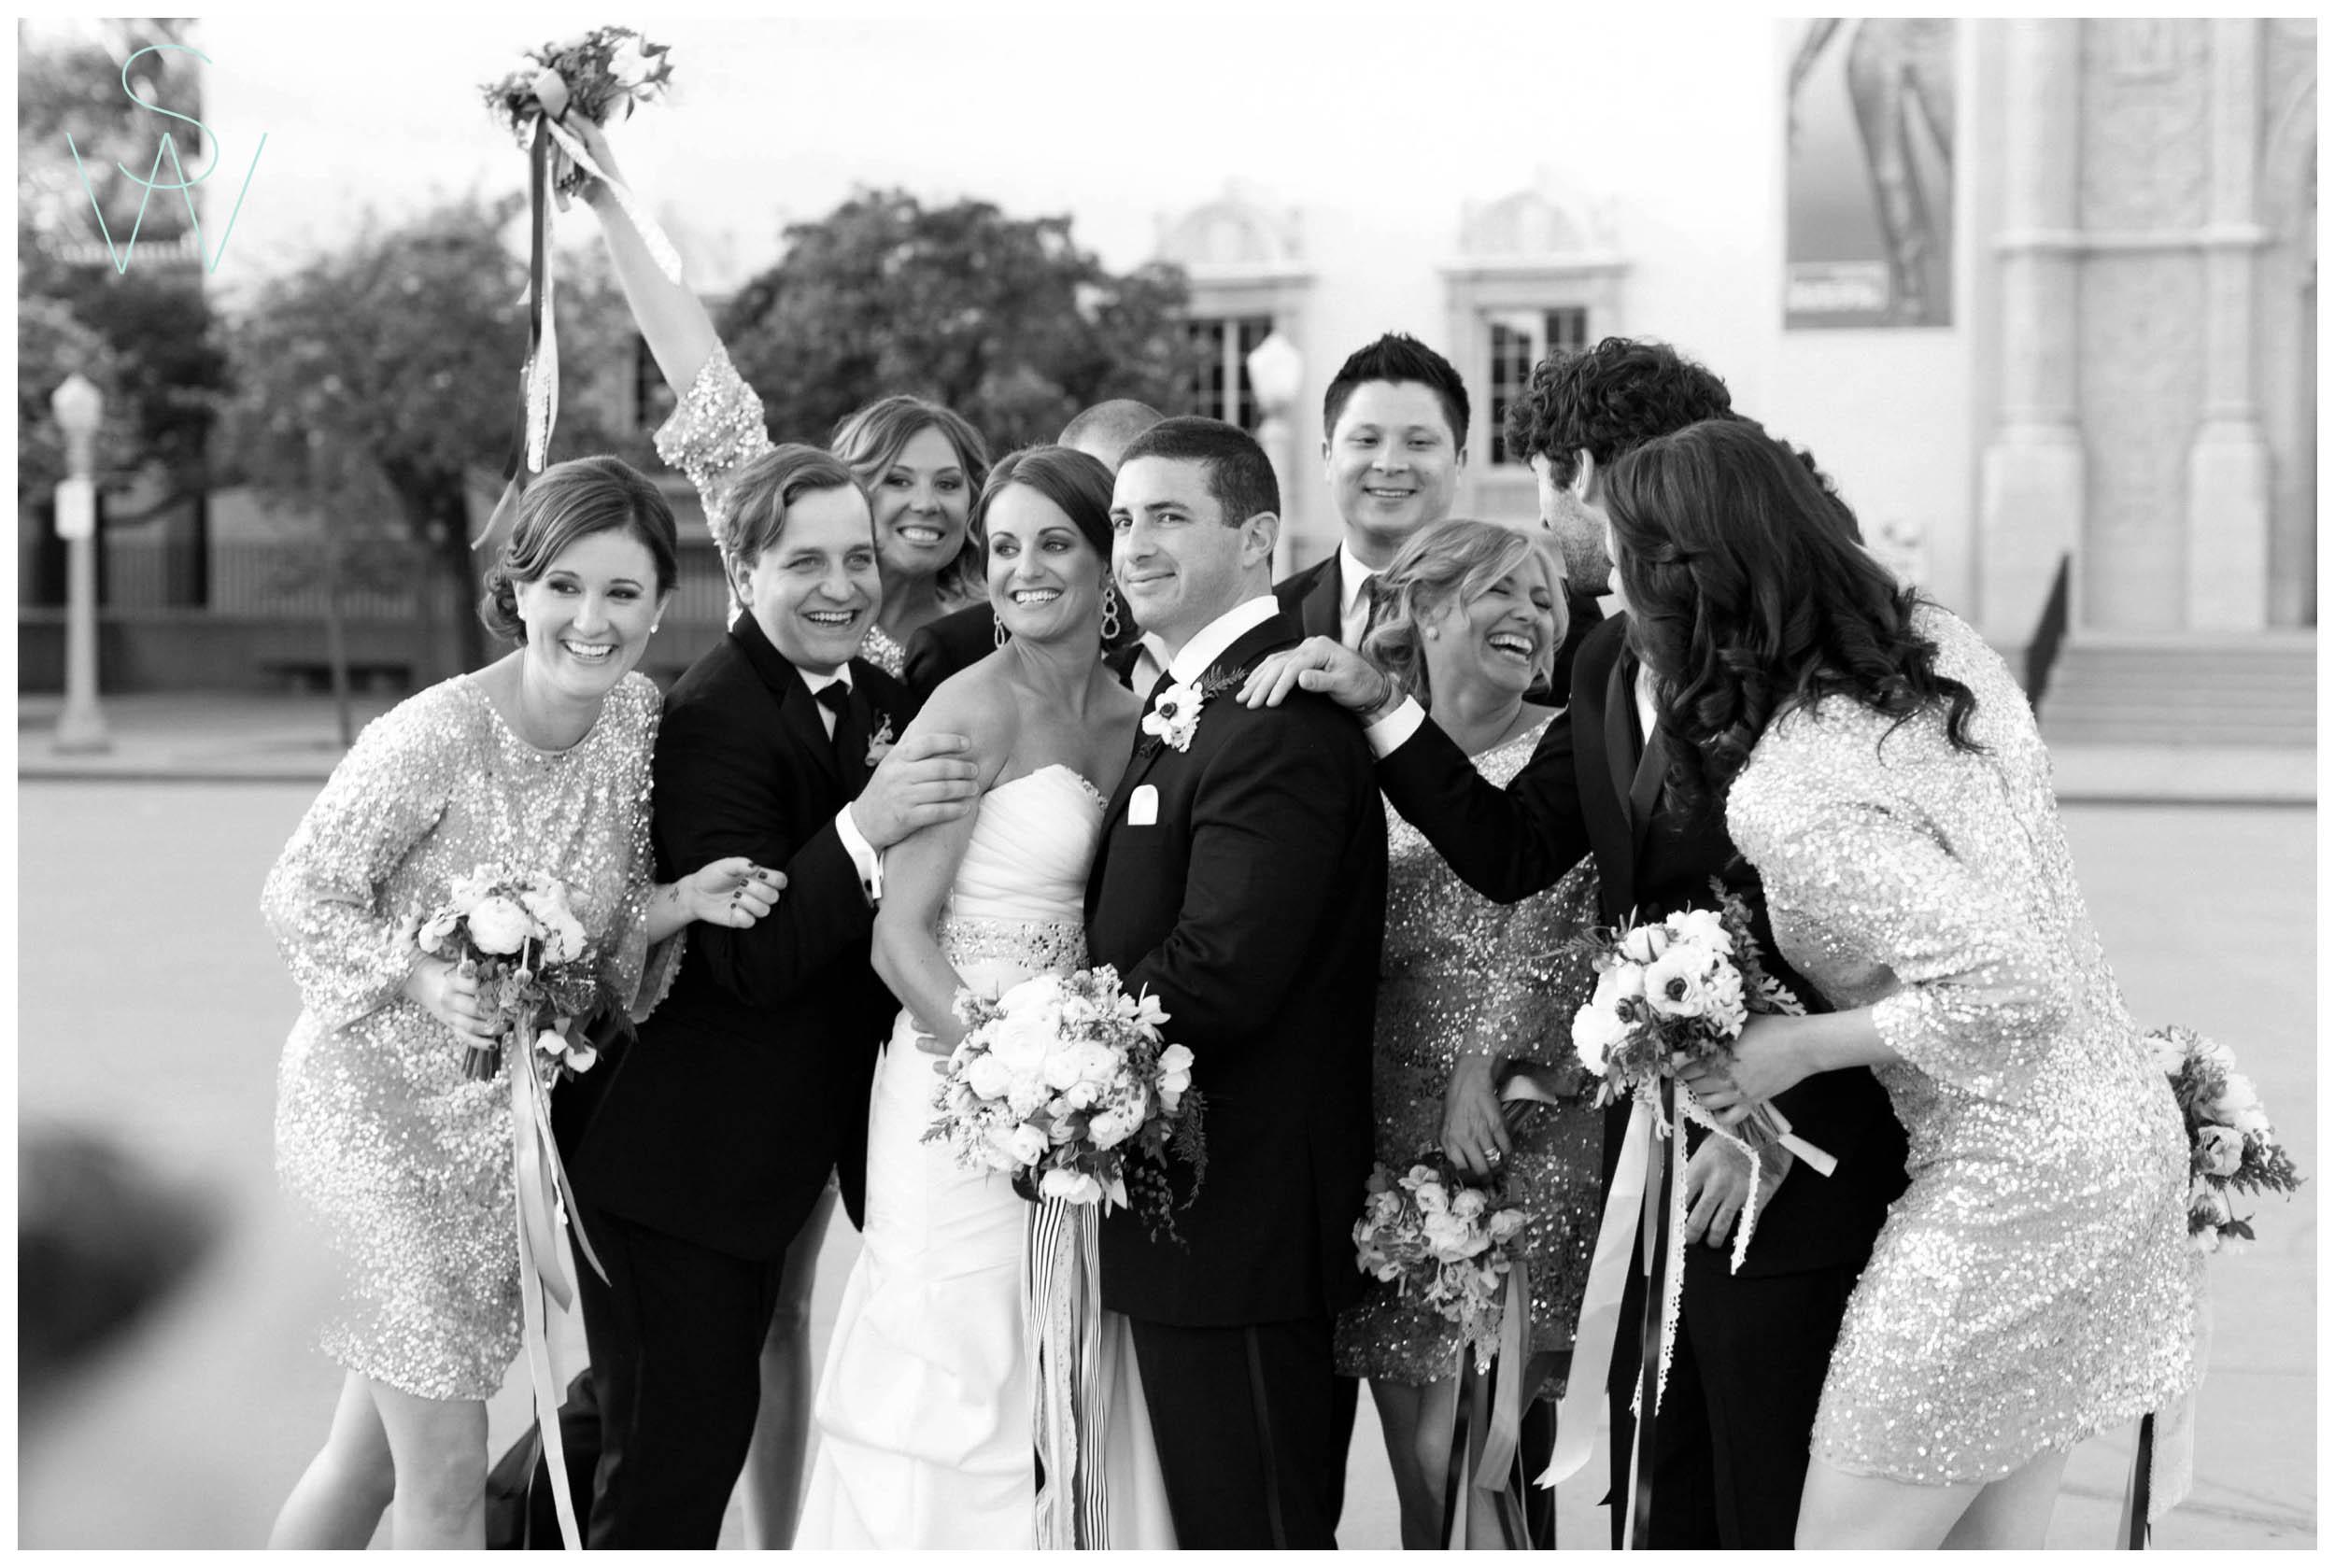 Shewanders.sdma_.wedding.photography-1028.jpg.wedding.photography-1028.jpg